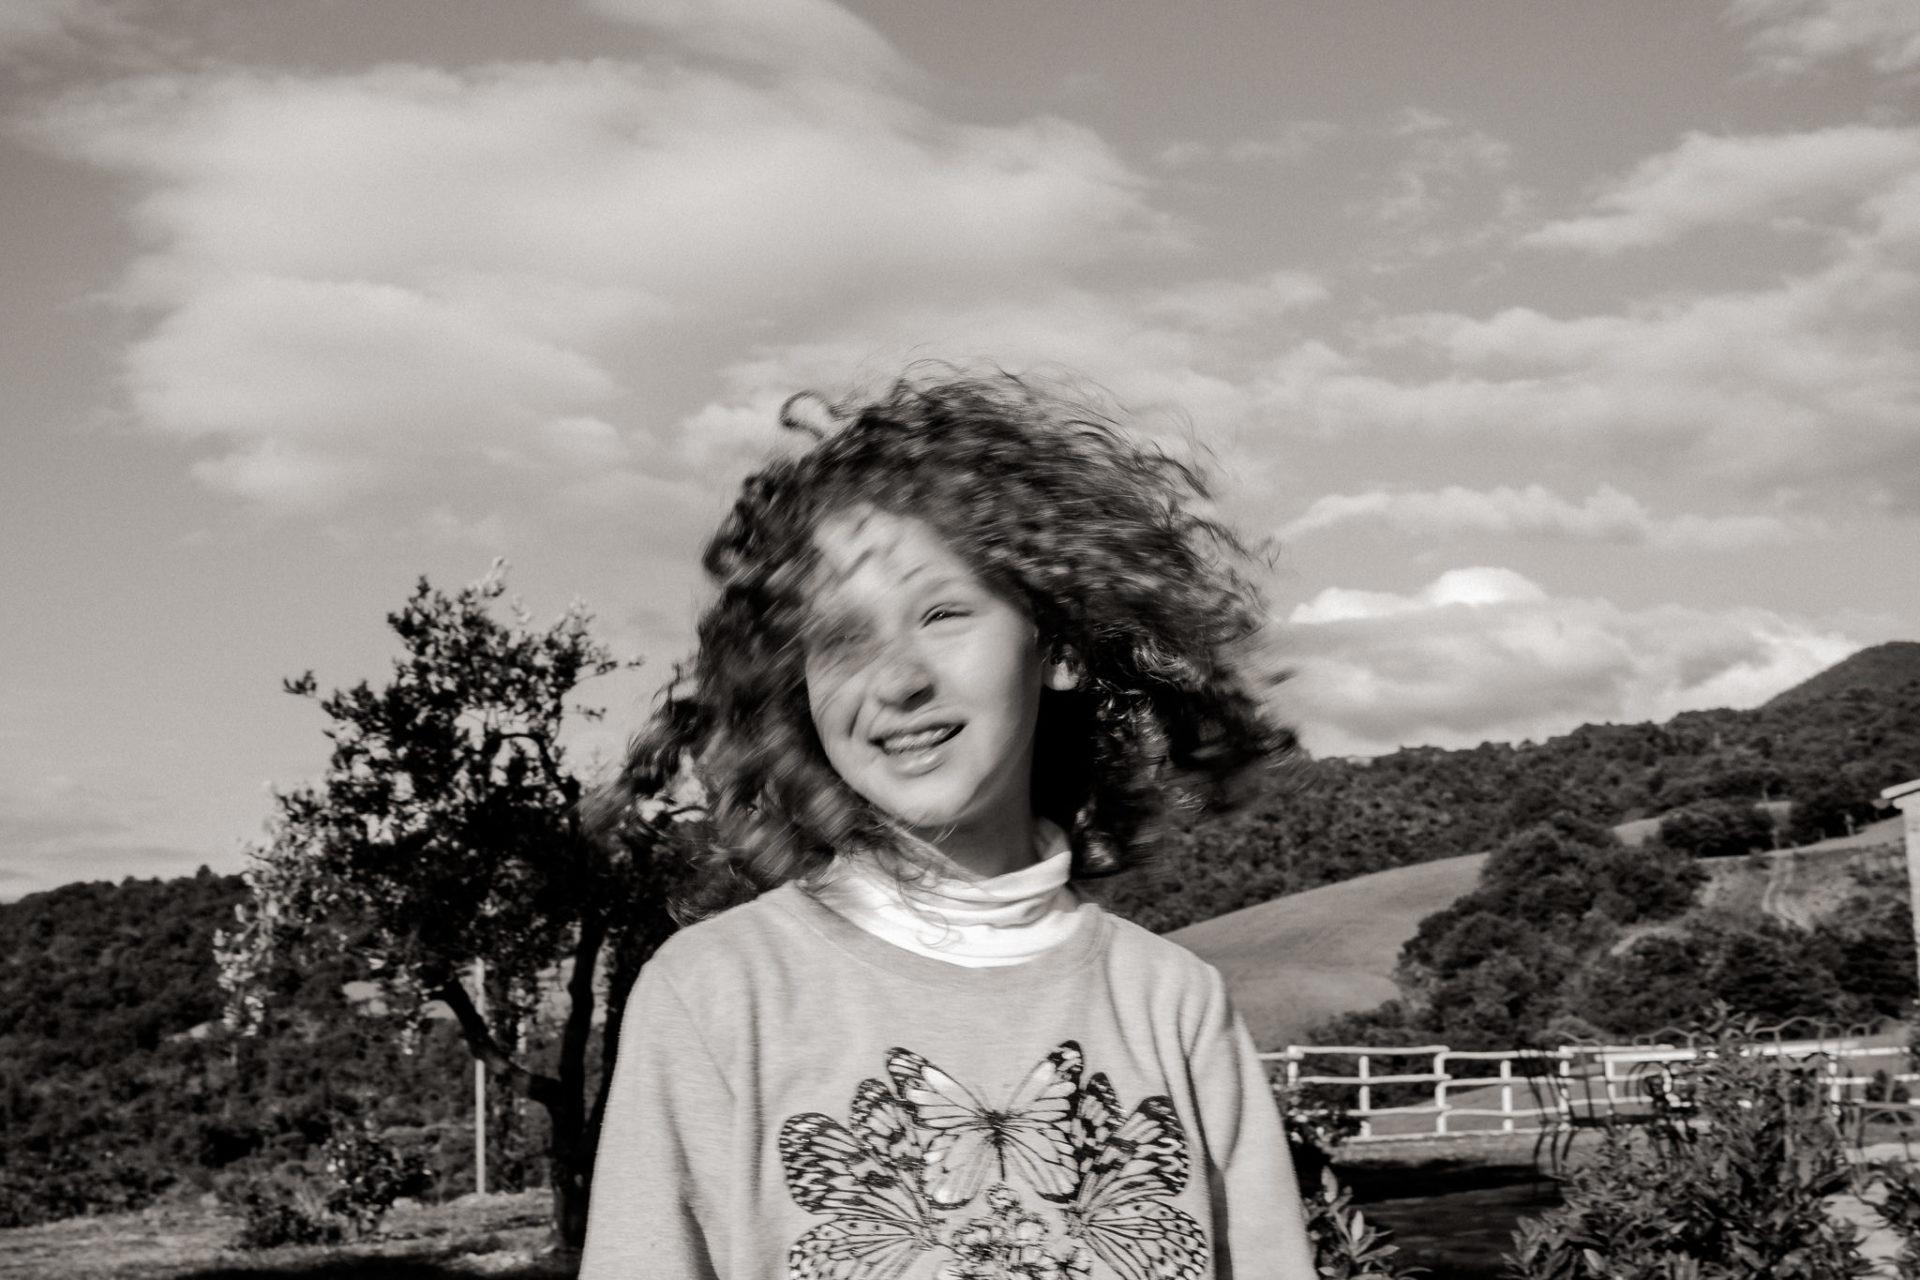 family photos holiday tuscany-daughter portrait-dimora santa margherita-travel italy-family portrait photographer stuttgart